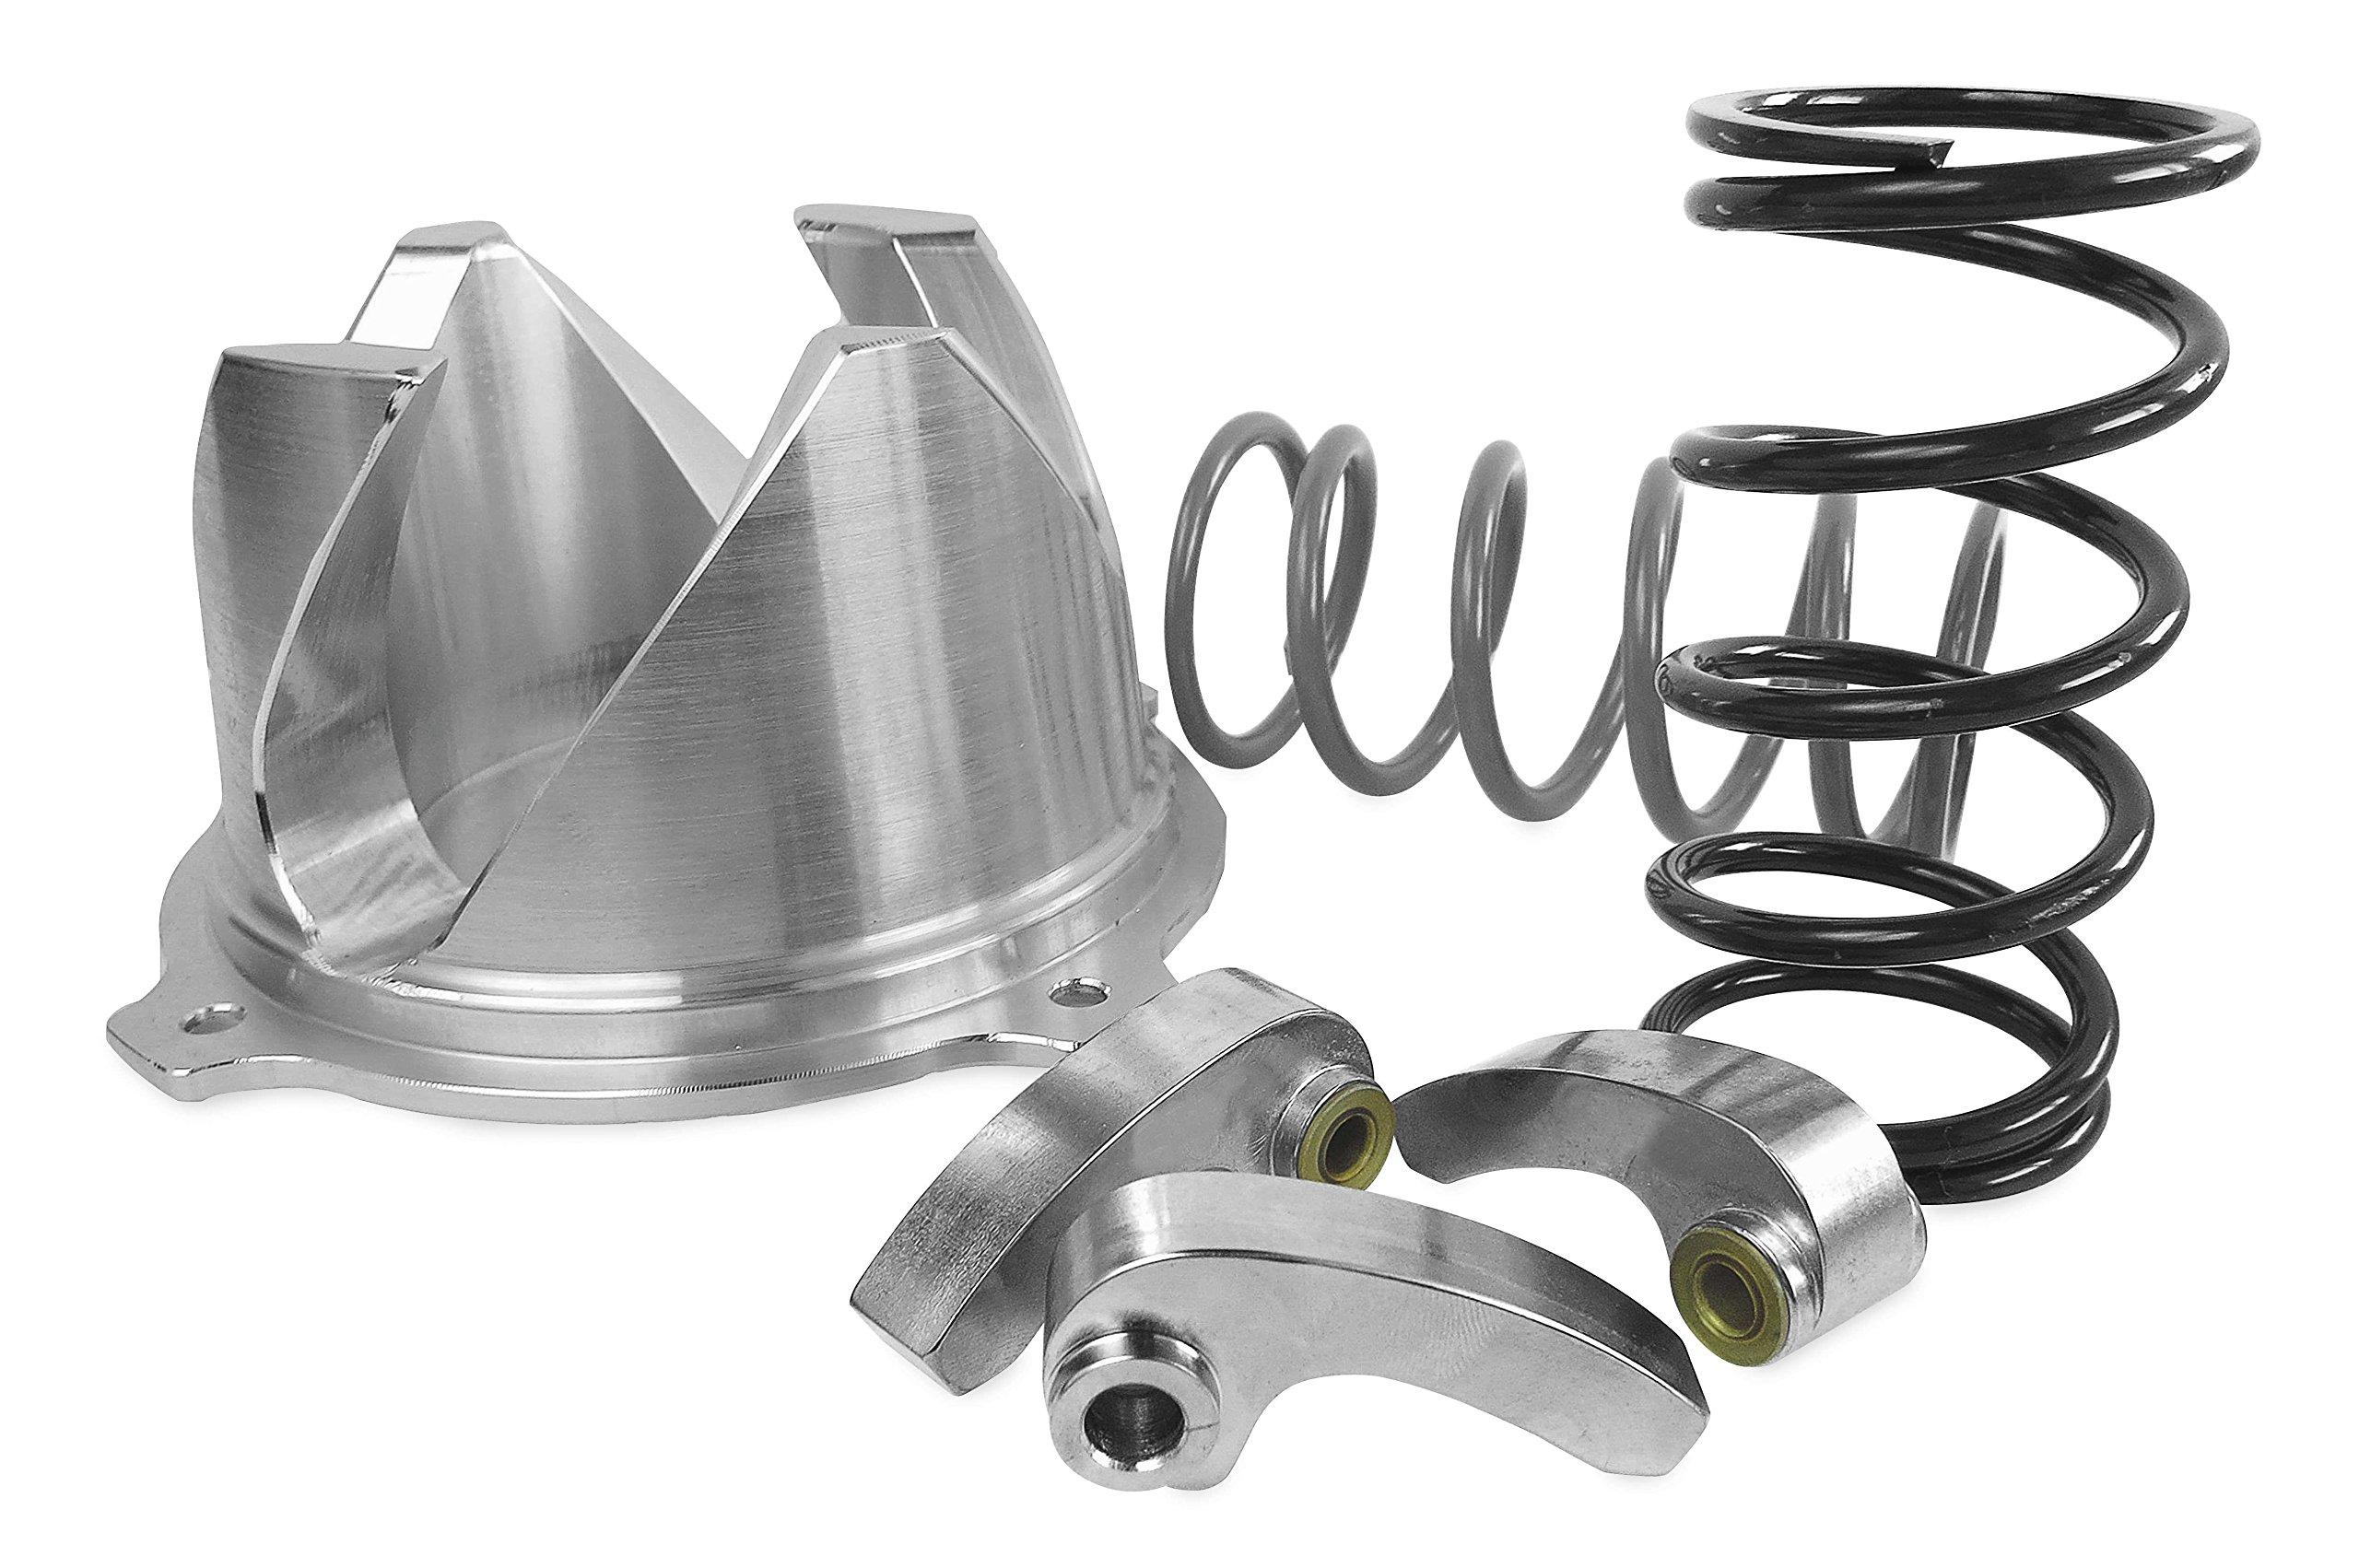 QuadBoss WE437341 Sport Utility Clutch Kit - Elevation: 0-3000ft. - Tire Size: 27-28in.